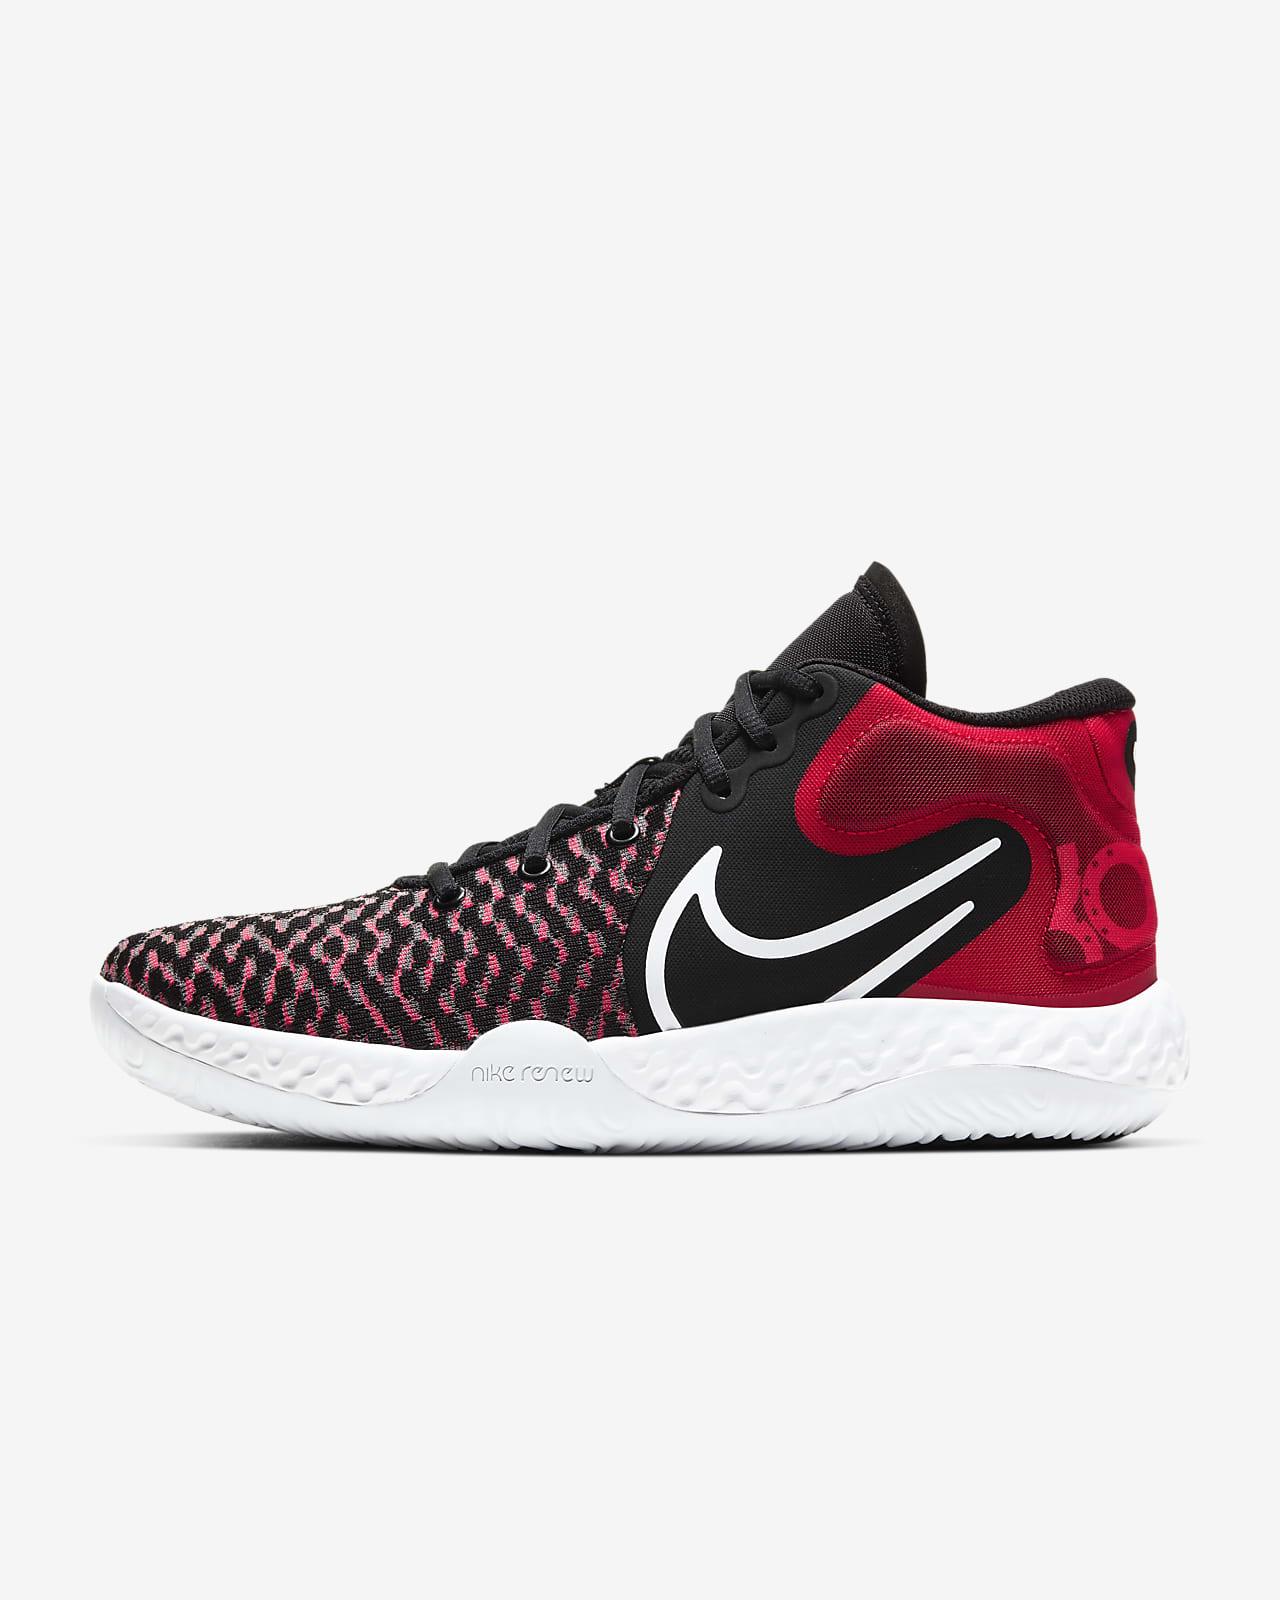 KD Trey 5 VIII Basketball Shoe. Nike SI